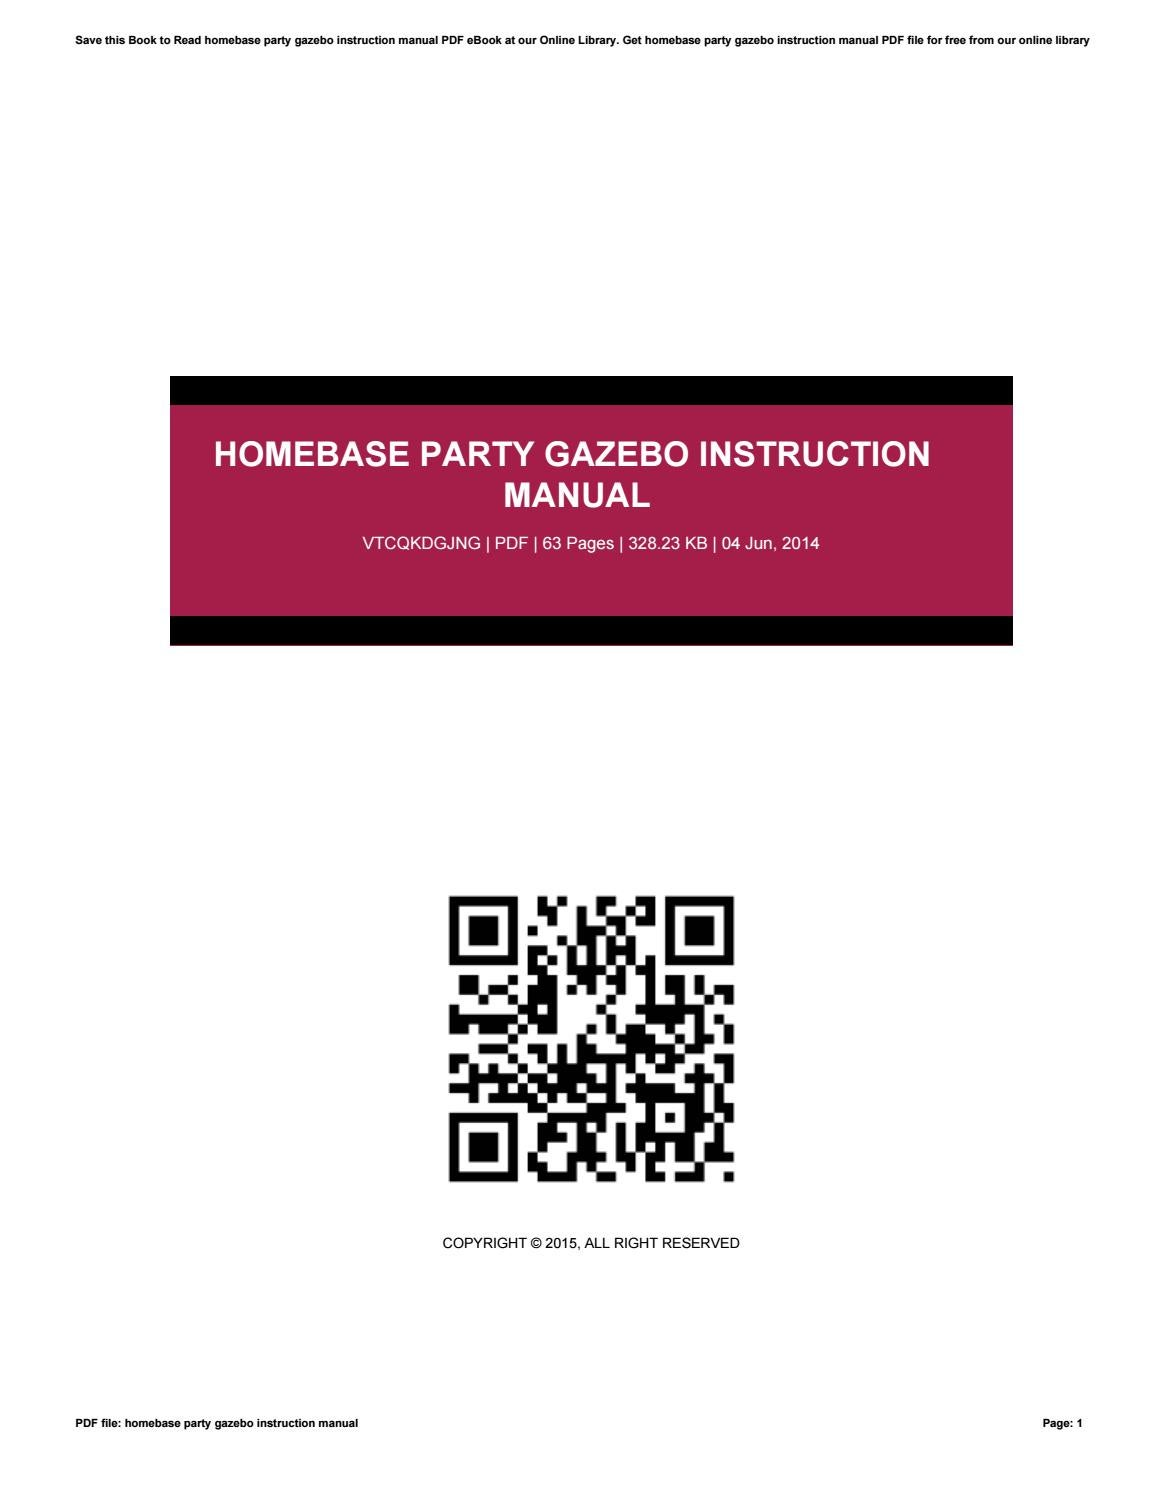 Homebase Party Gazebo Instruction Manual By Randy Issuu